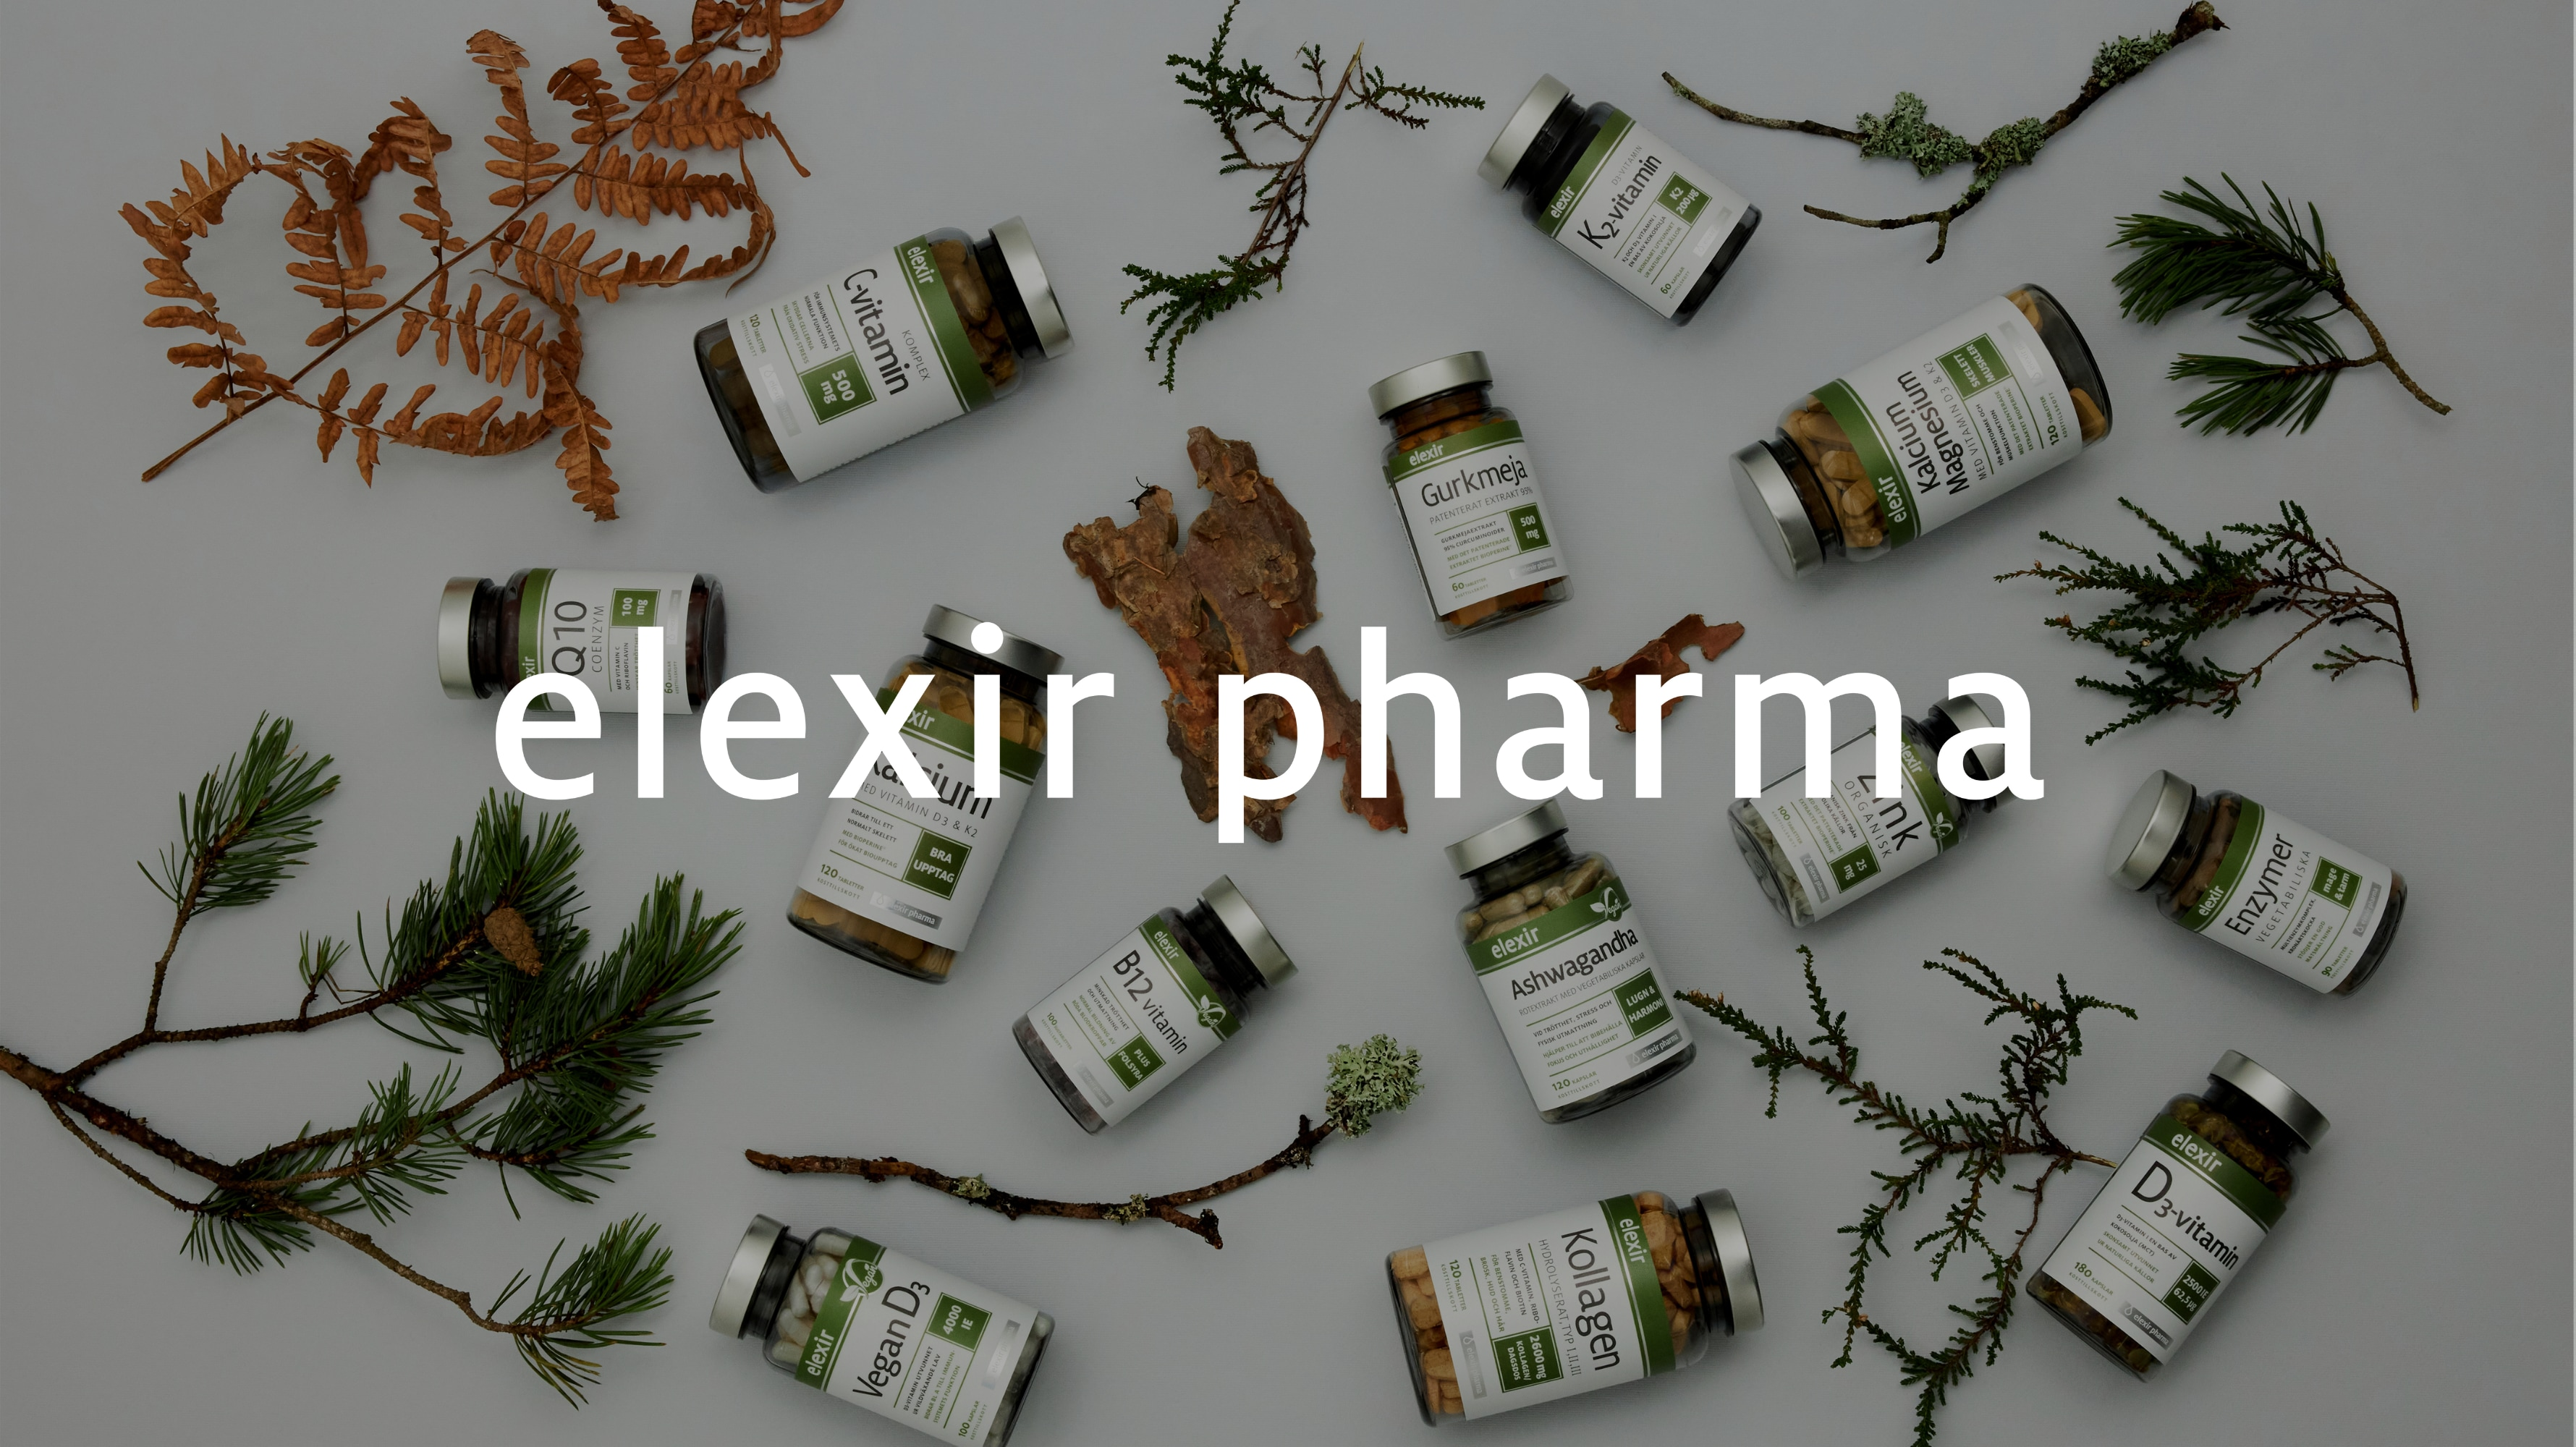 https://halsokosten.se/pub_images/original/Elexir_Pharma_vm.png